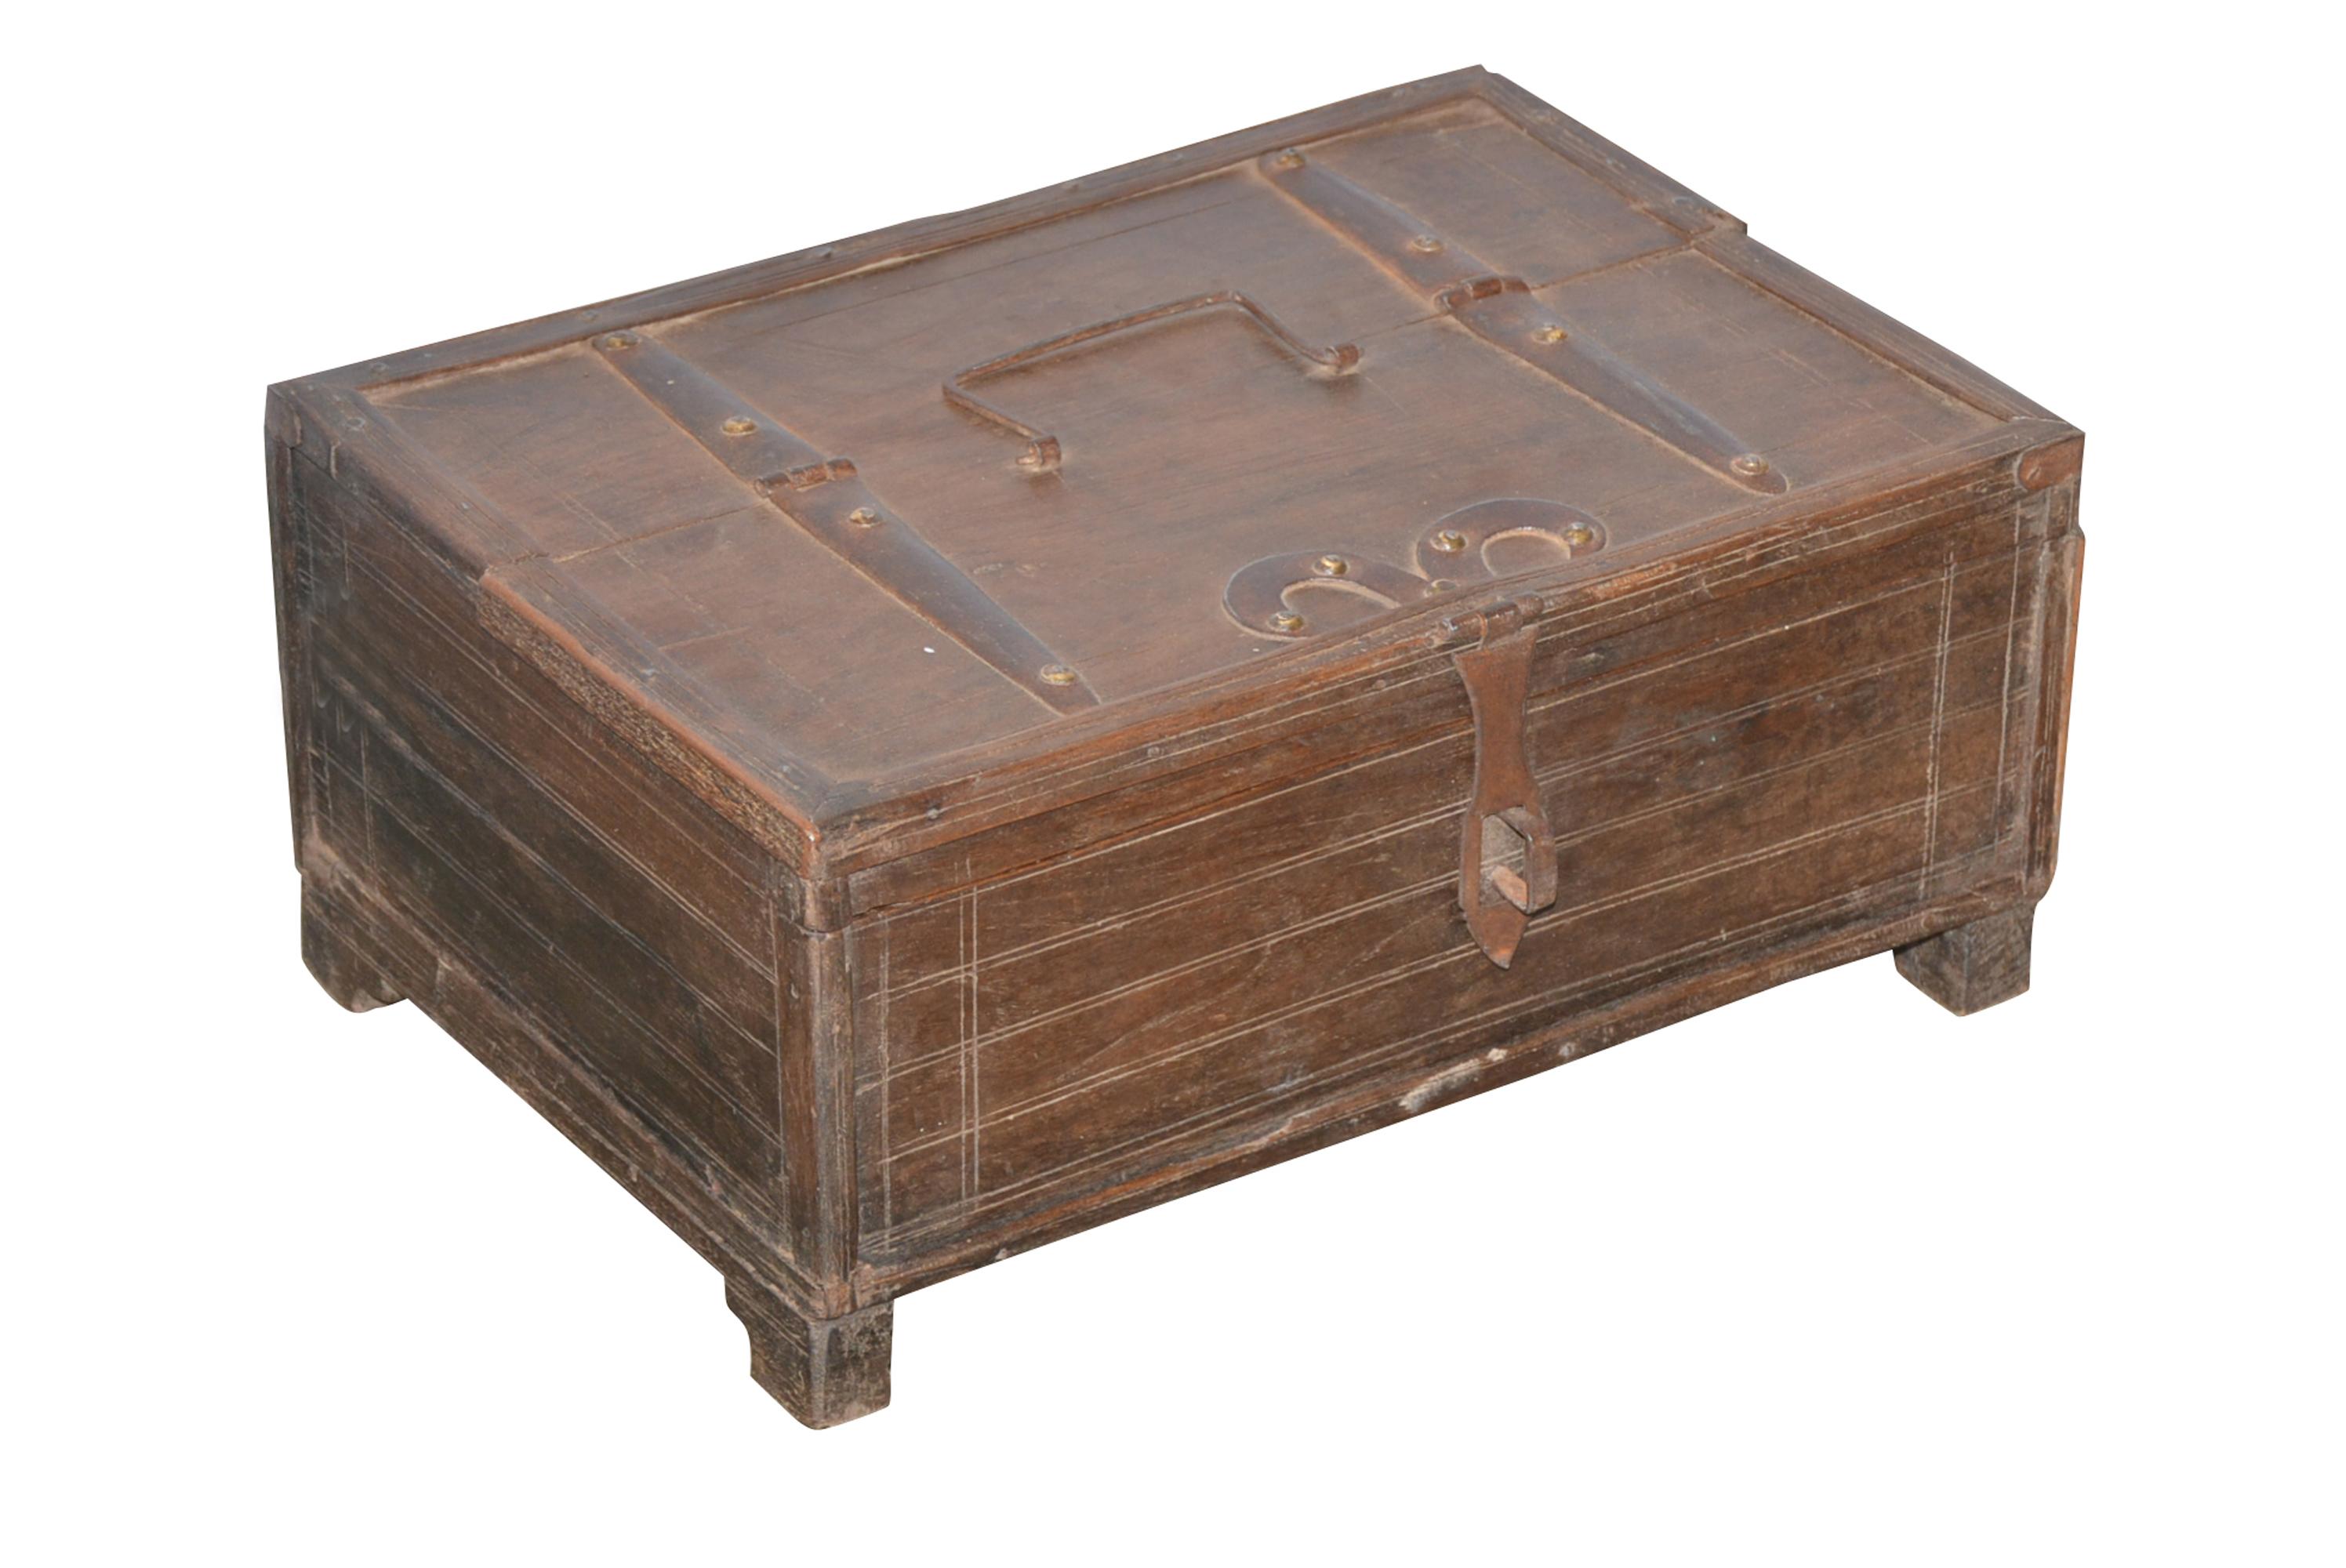 ANRA1597 - 33 x 23 x 15 cm